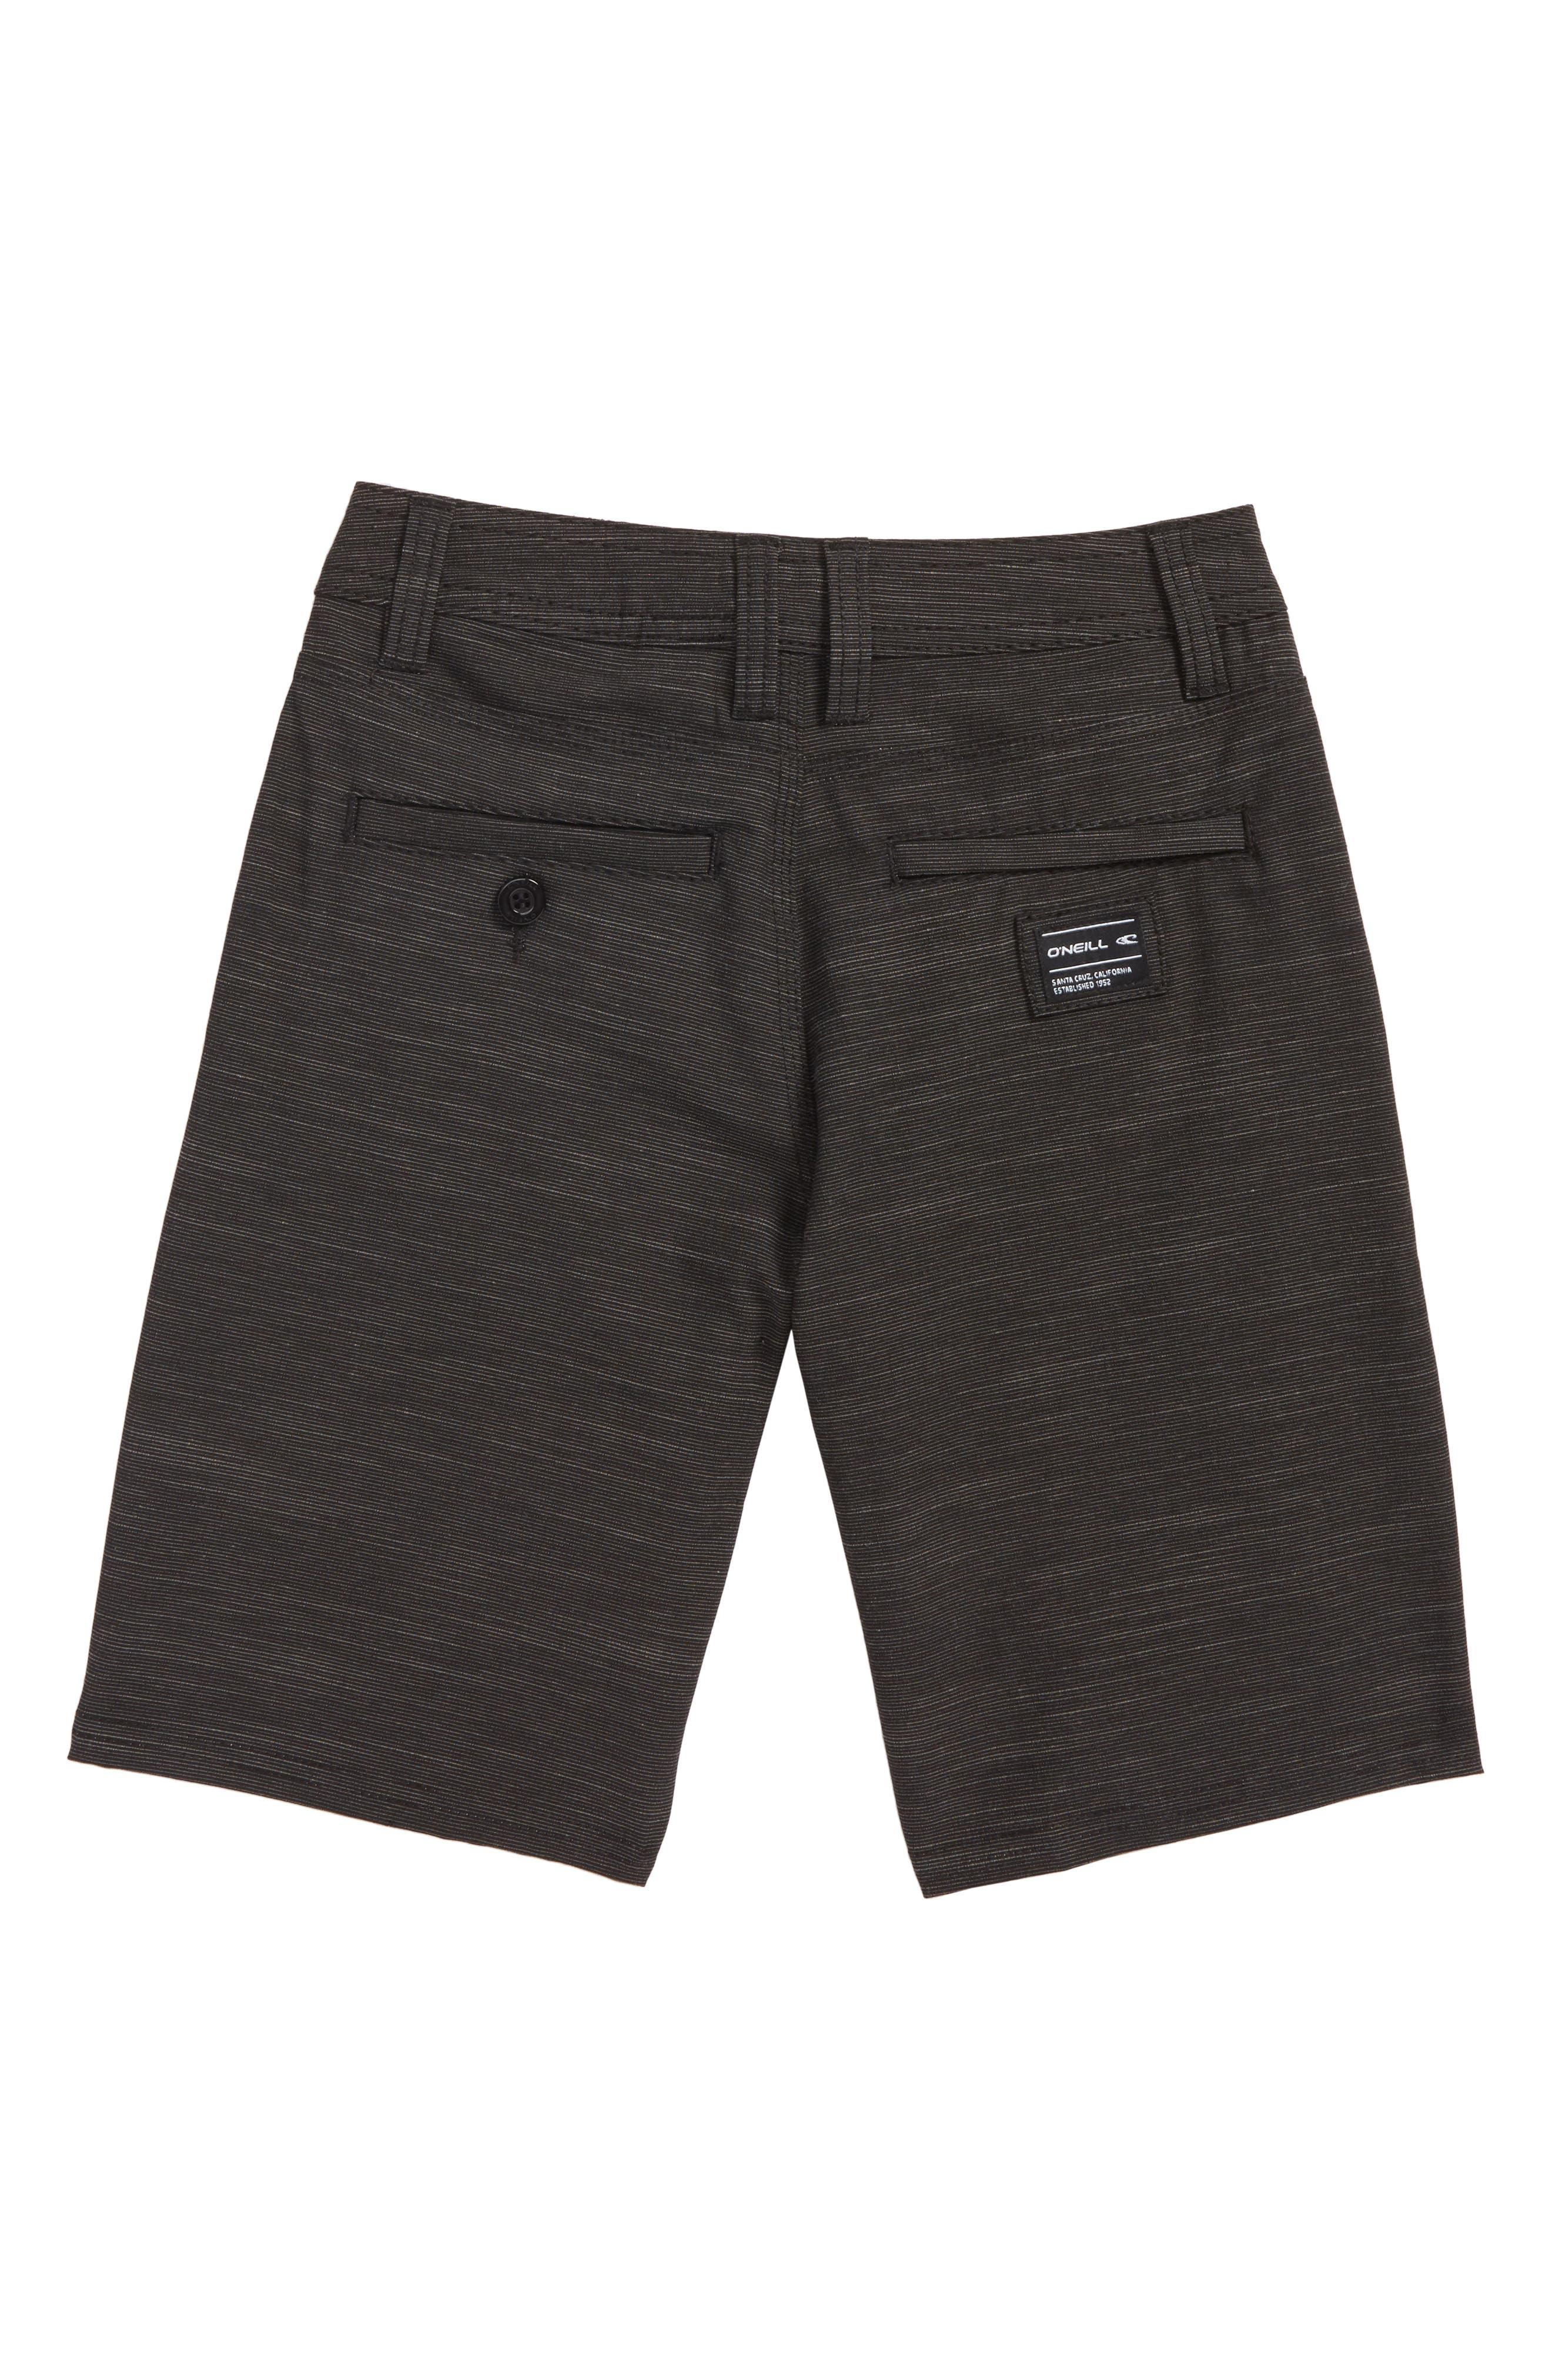 Locked Slub Hybrid Board Shorts,                             Alternate thumbnail 2, color,                             001